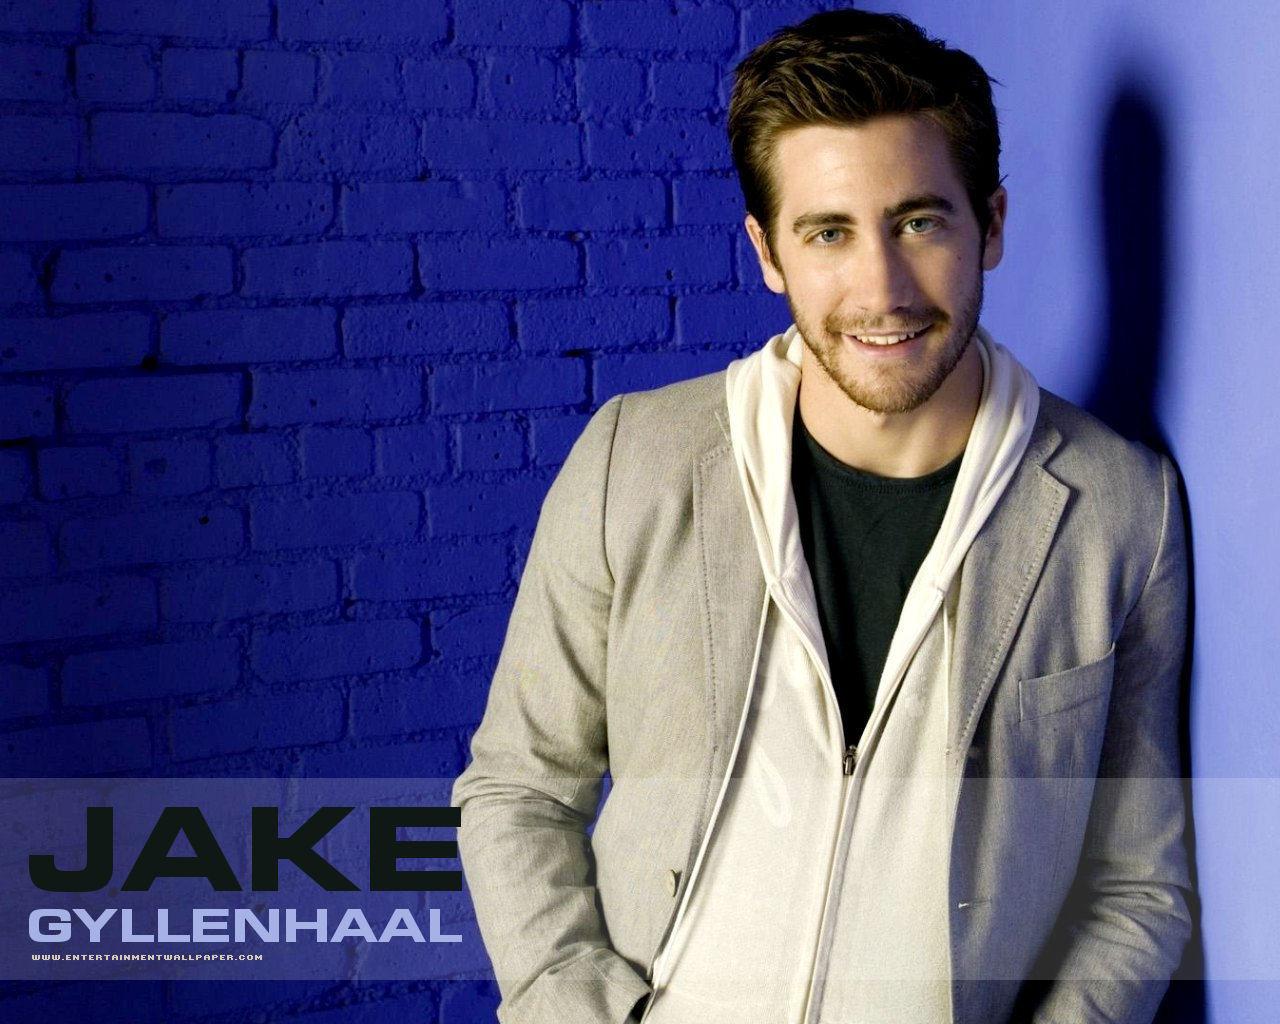 Jake Gyllenhaal | The Male Celebrity Maggie Gyllenhaal Jewish